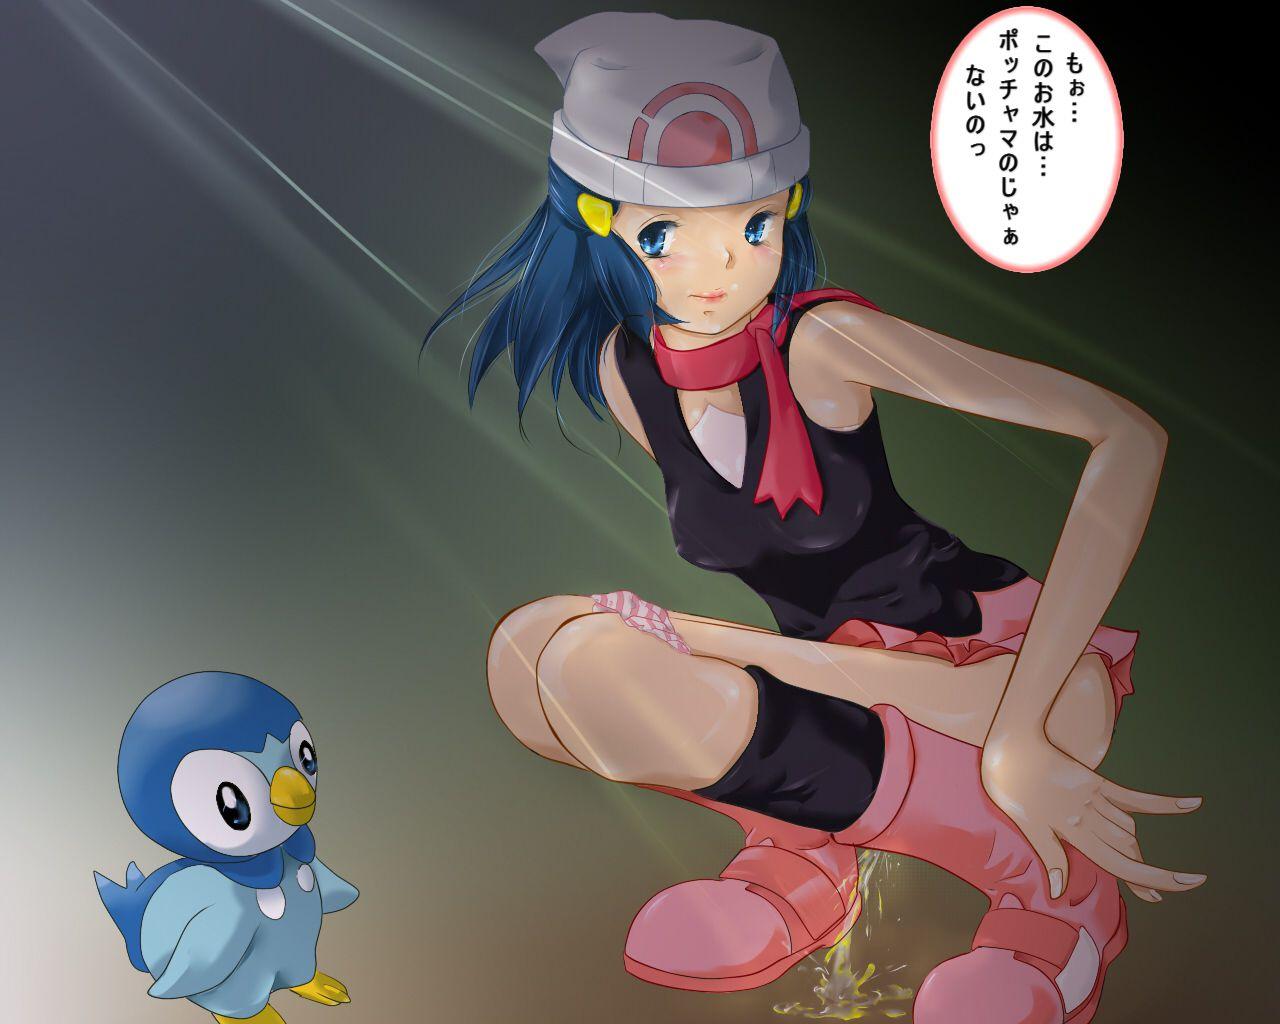 hikari_(pokemon)352